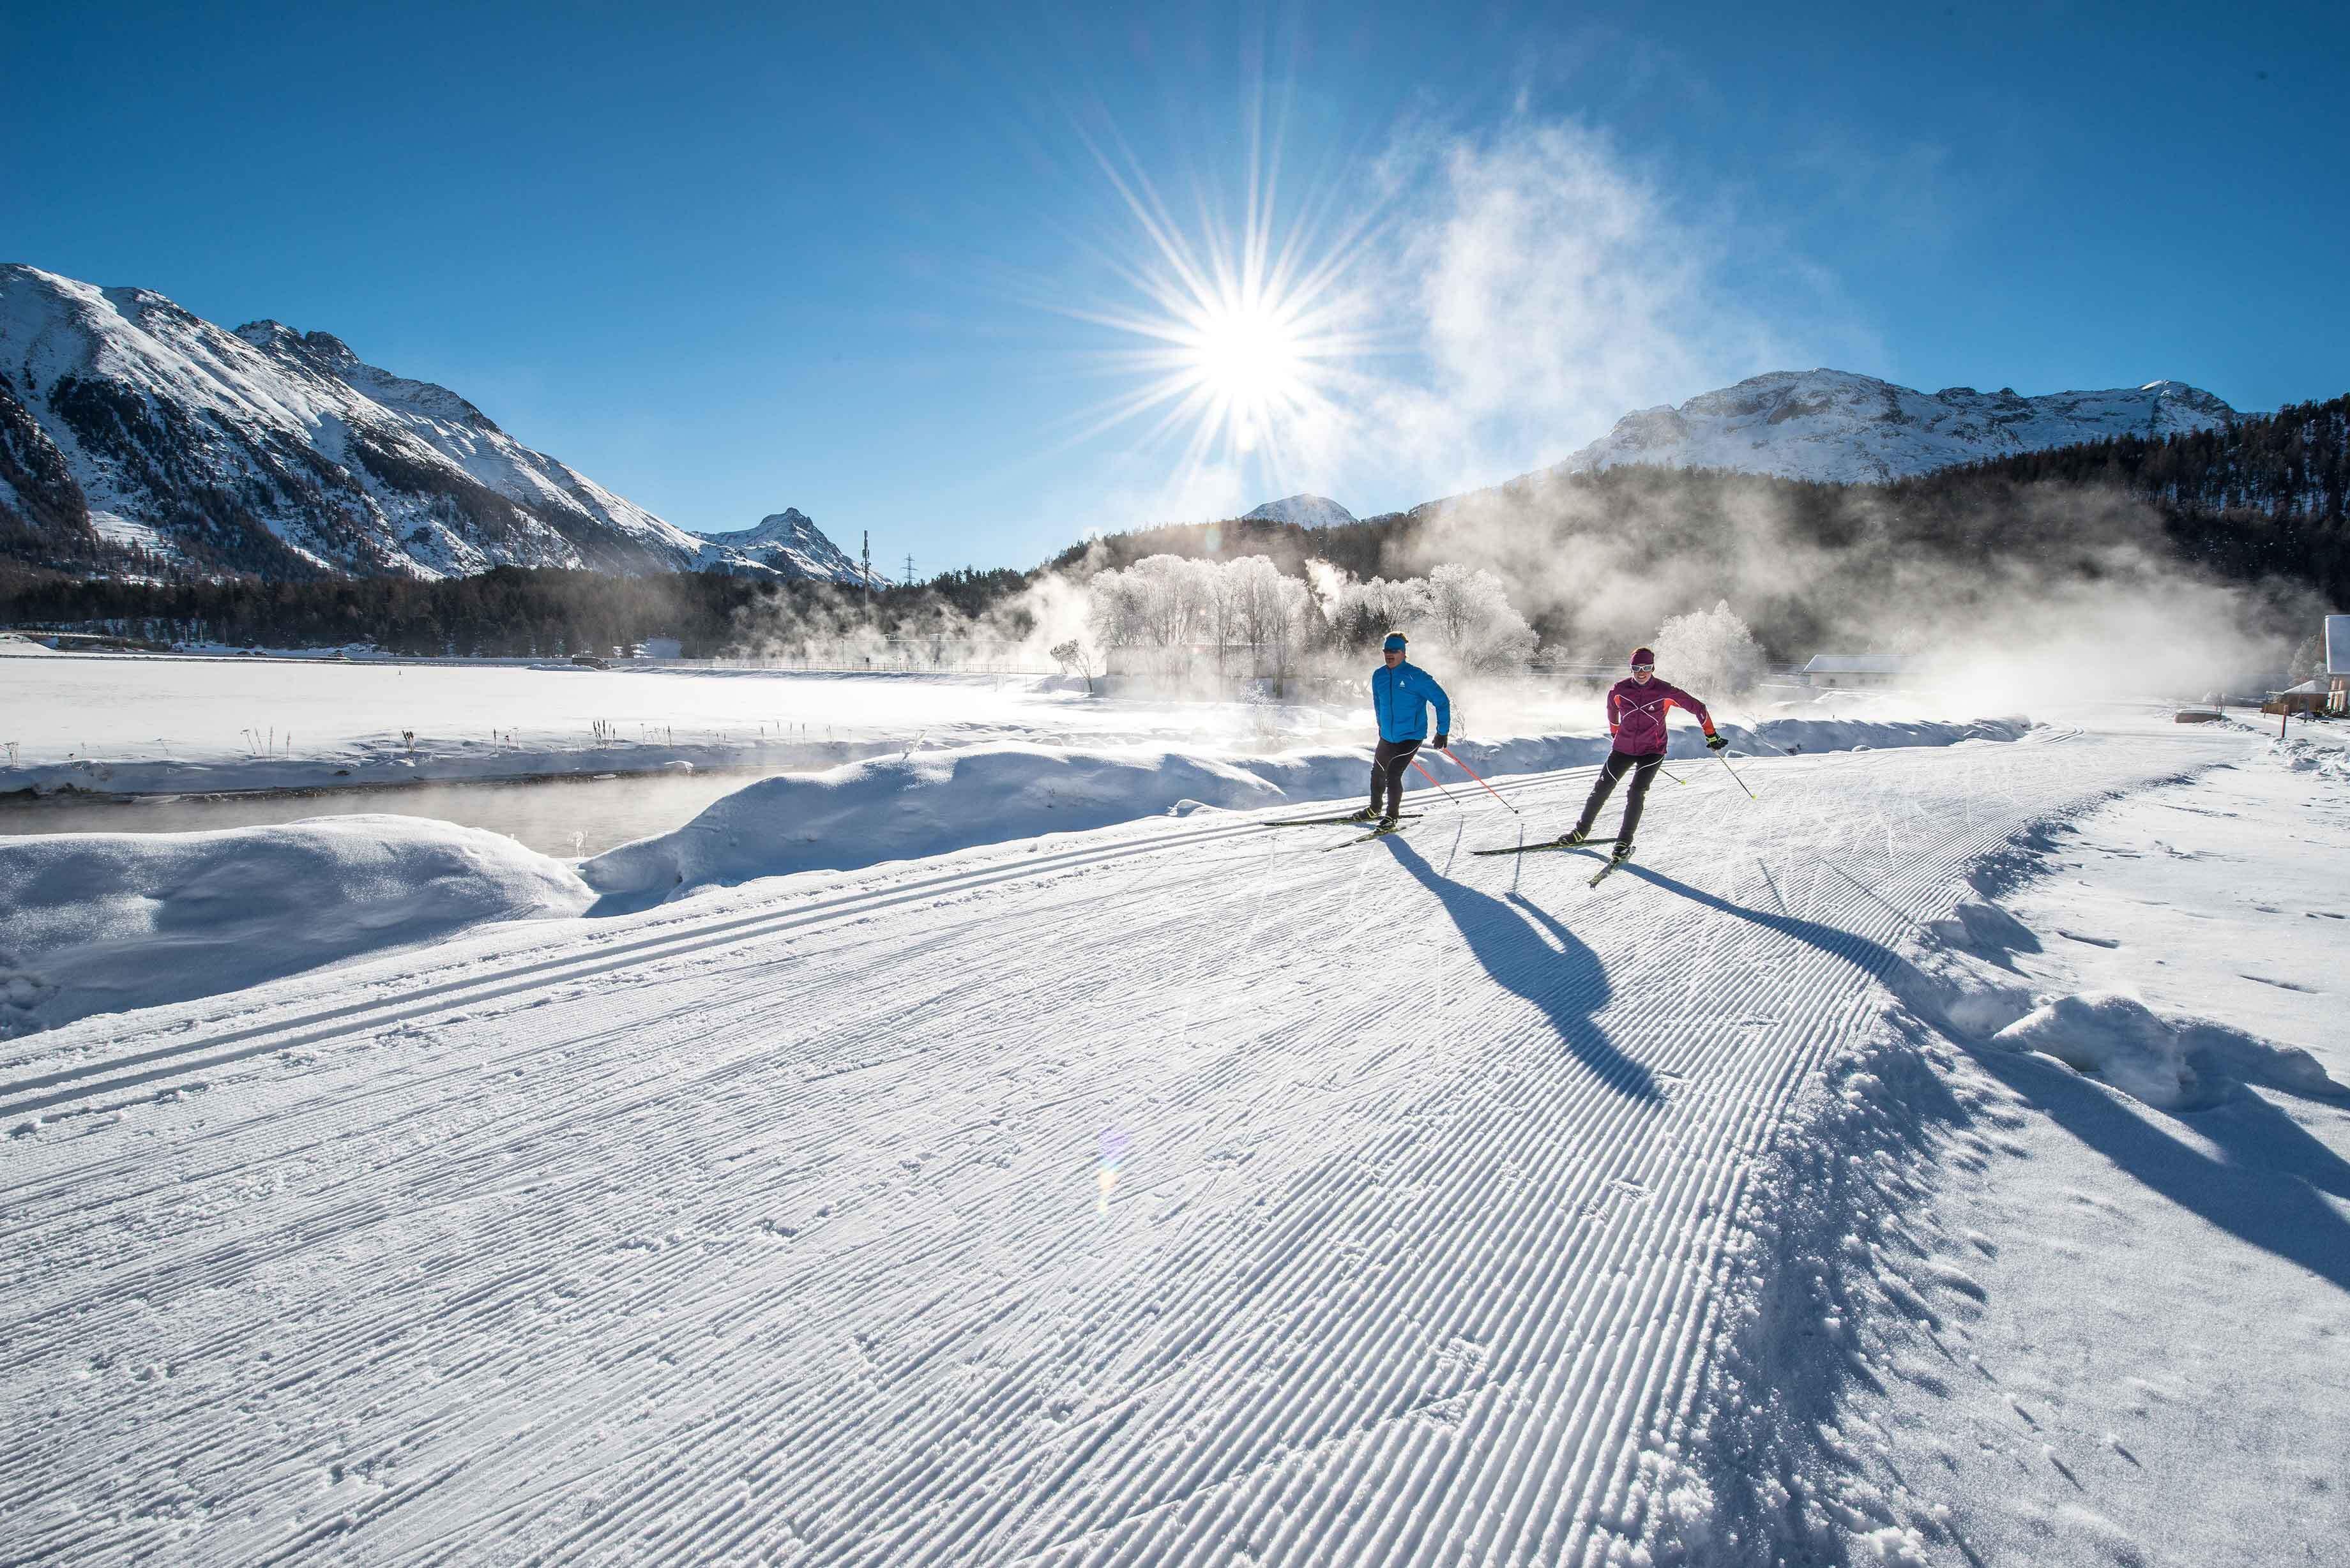 Nordic St. Moritz